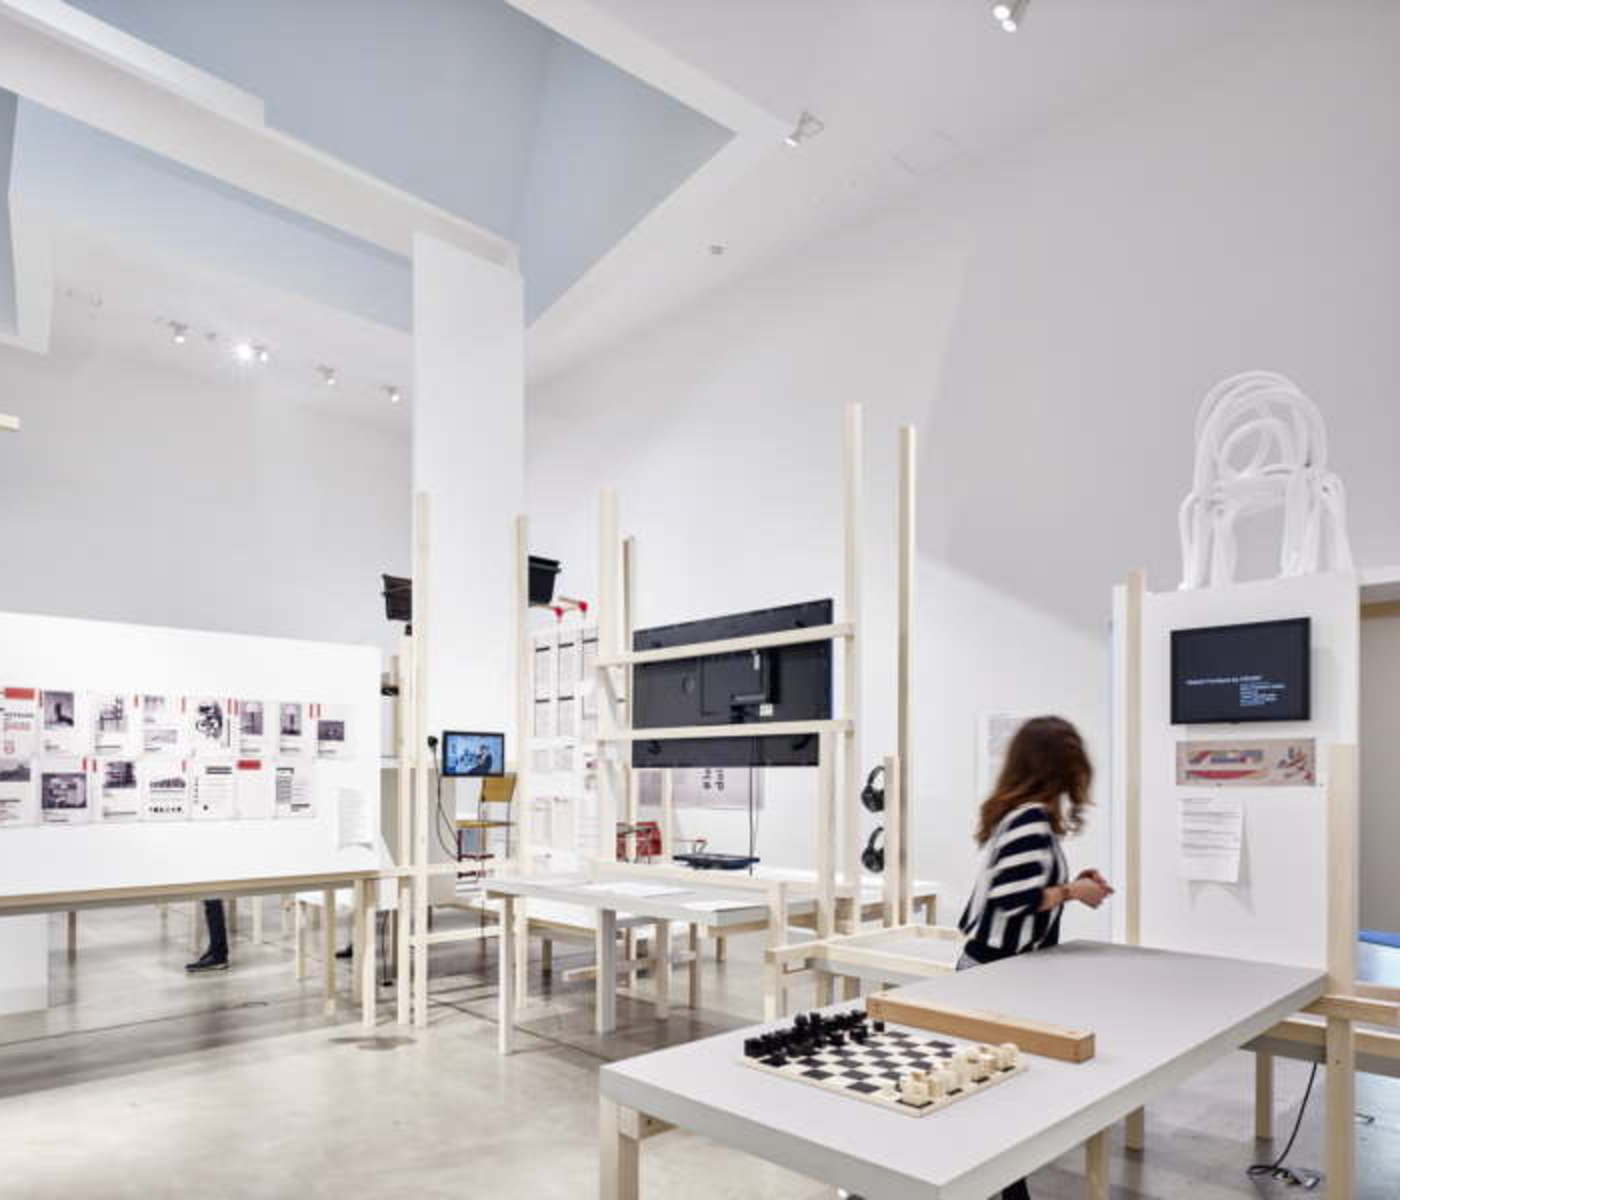 ausstellung vitra design museum das bauhaus. Black Bedroom Furniture Sets. Home Design Ideas